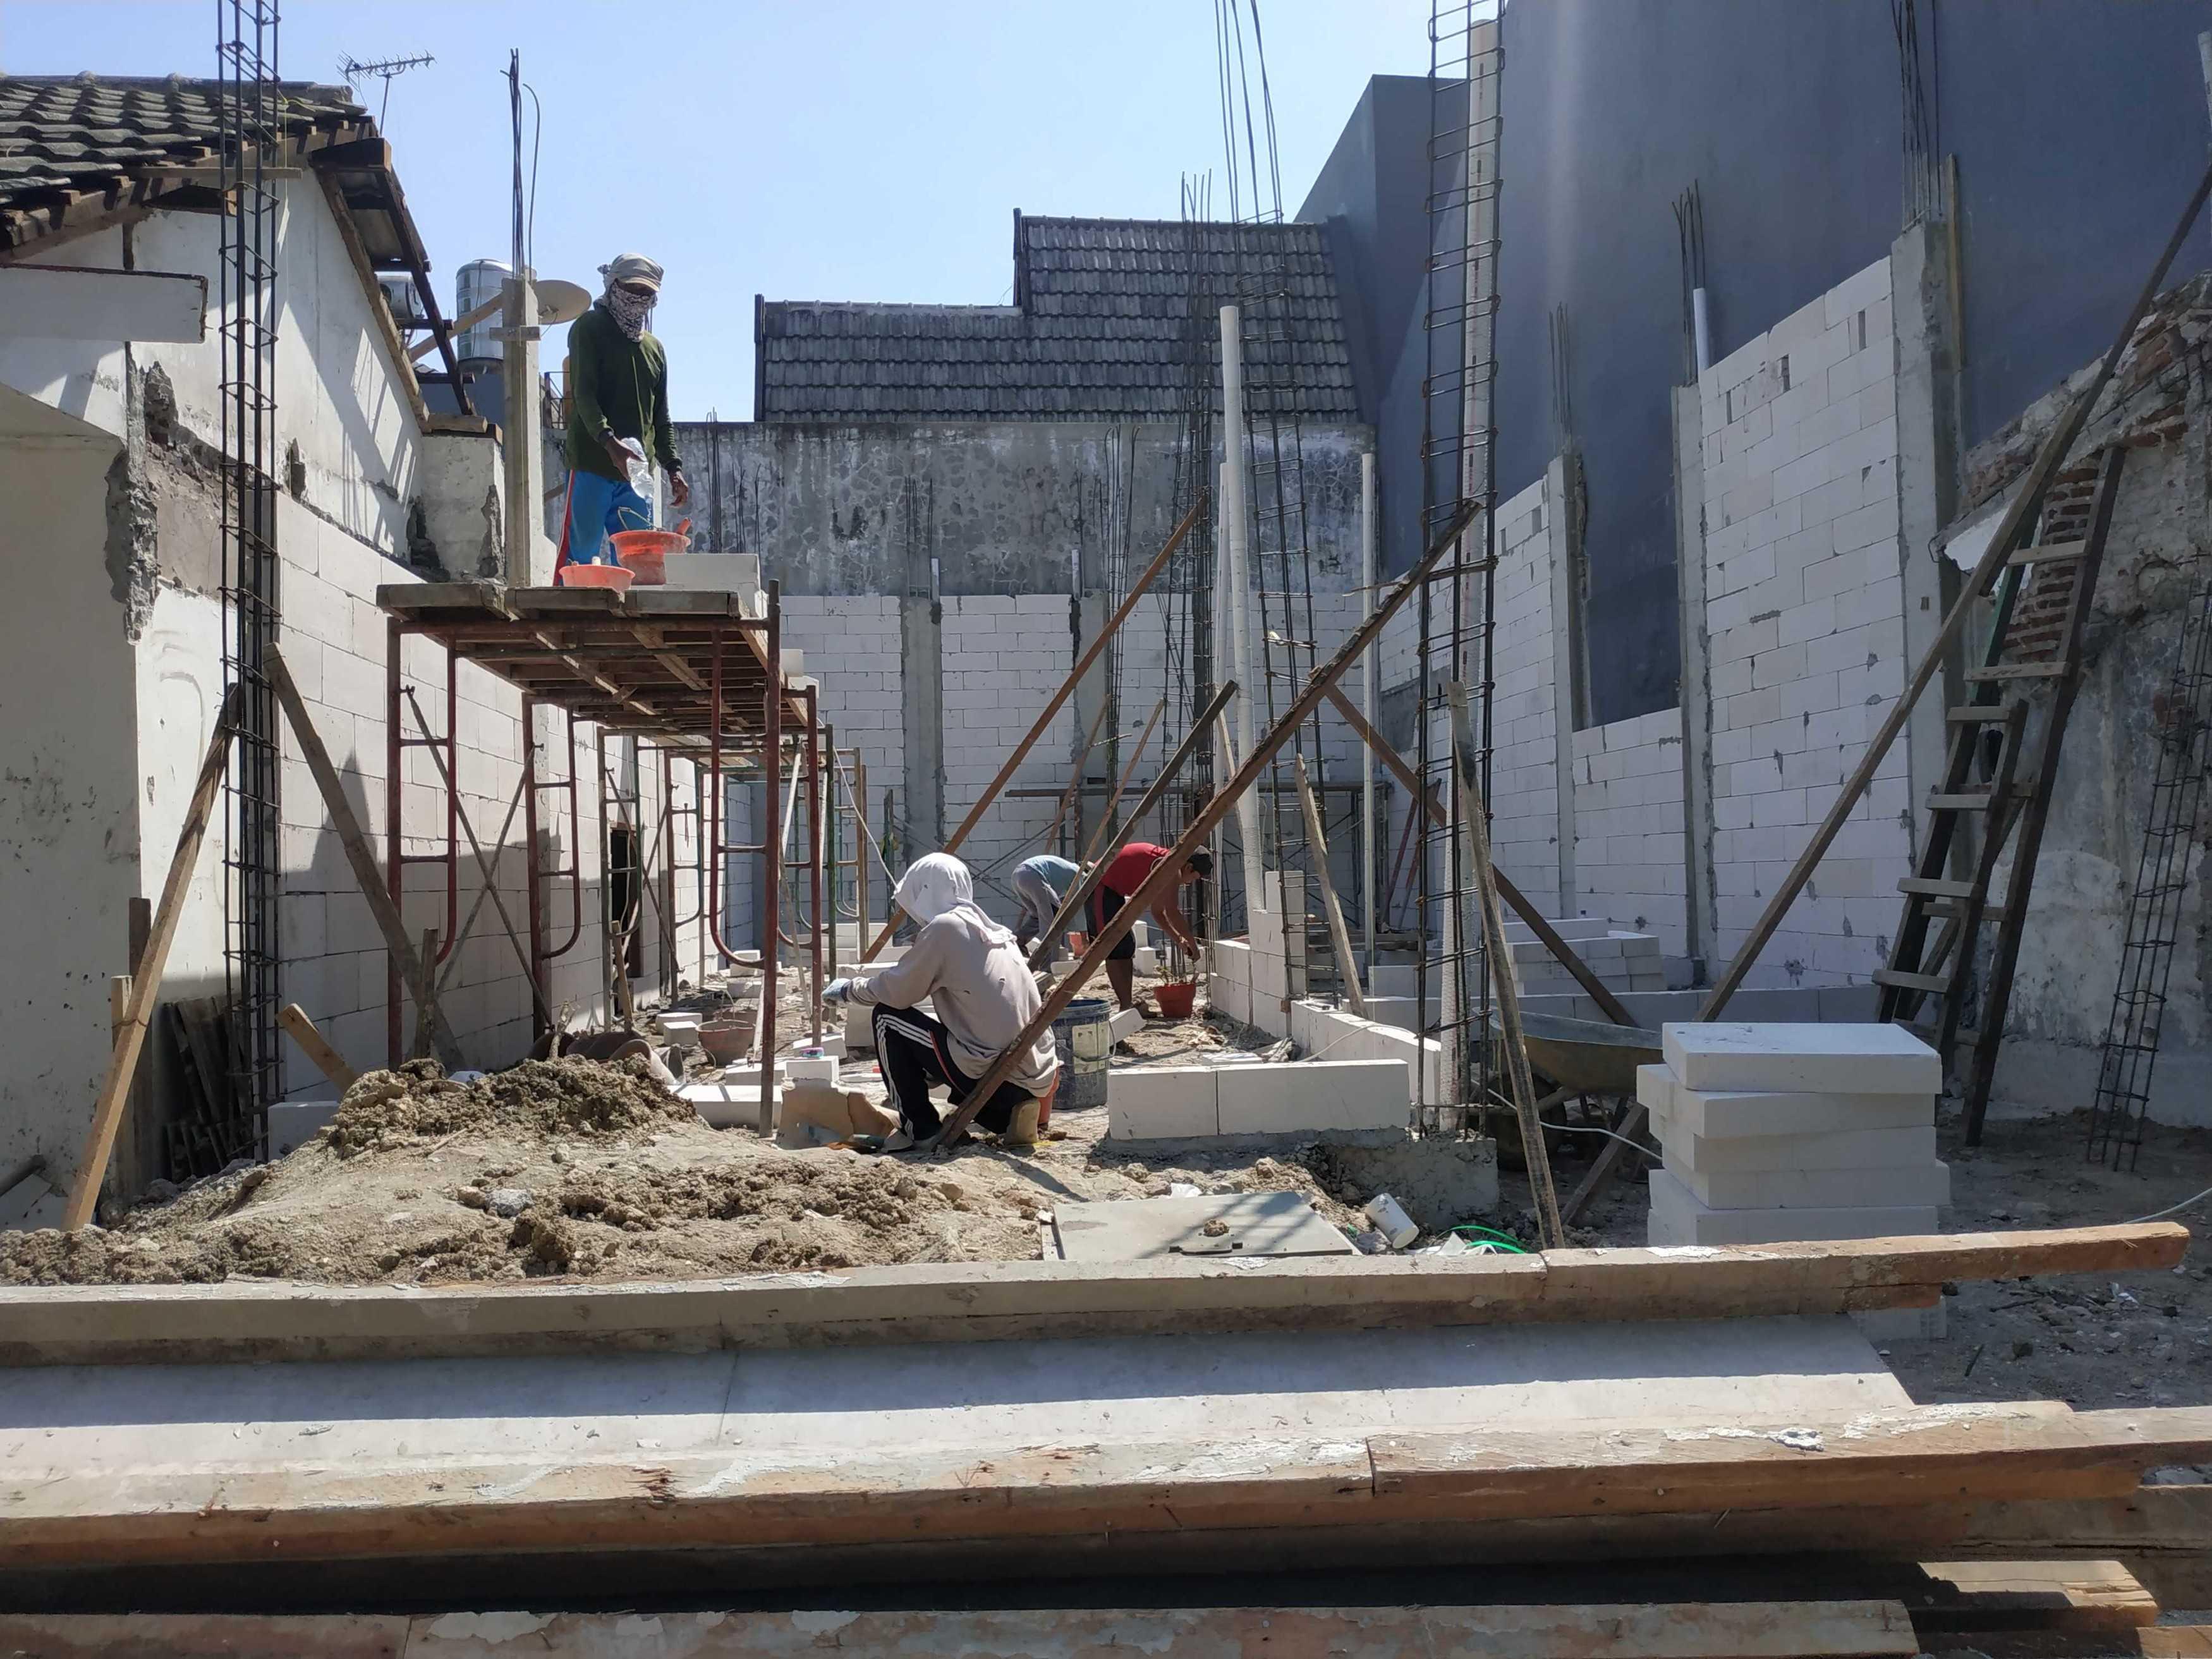 Gradasi Rumah Ibu Dewa Surabaya, Kota Sby, Jawa Timur, Indonesia Surabaya, Kota Sby, Jawa Timur, Indonesia Gradasi7-Rumah-Ibu-Dewa   89013